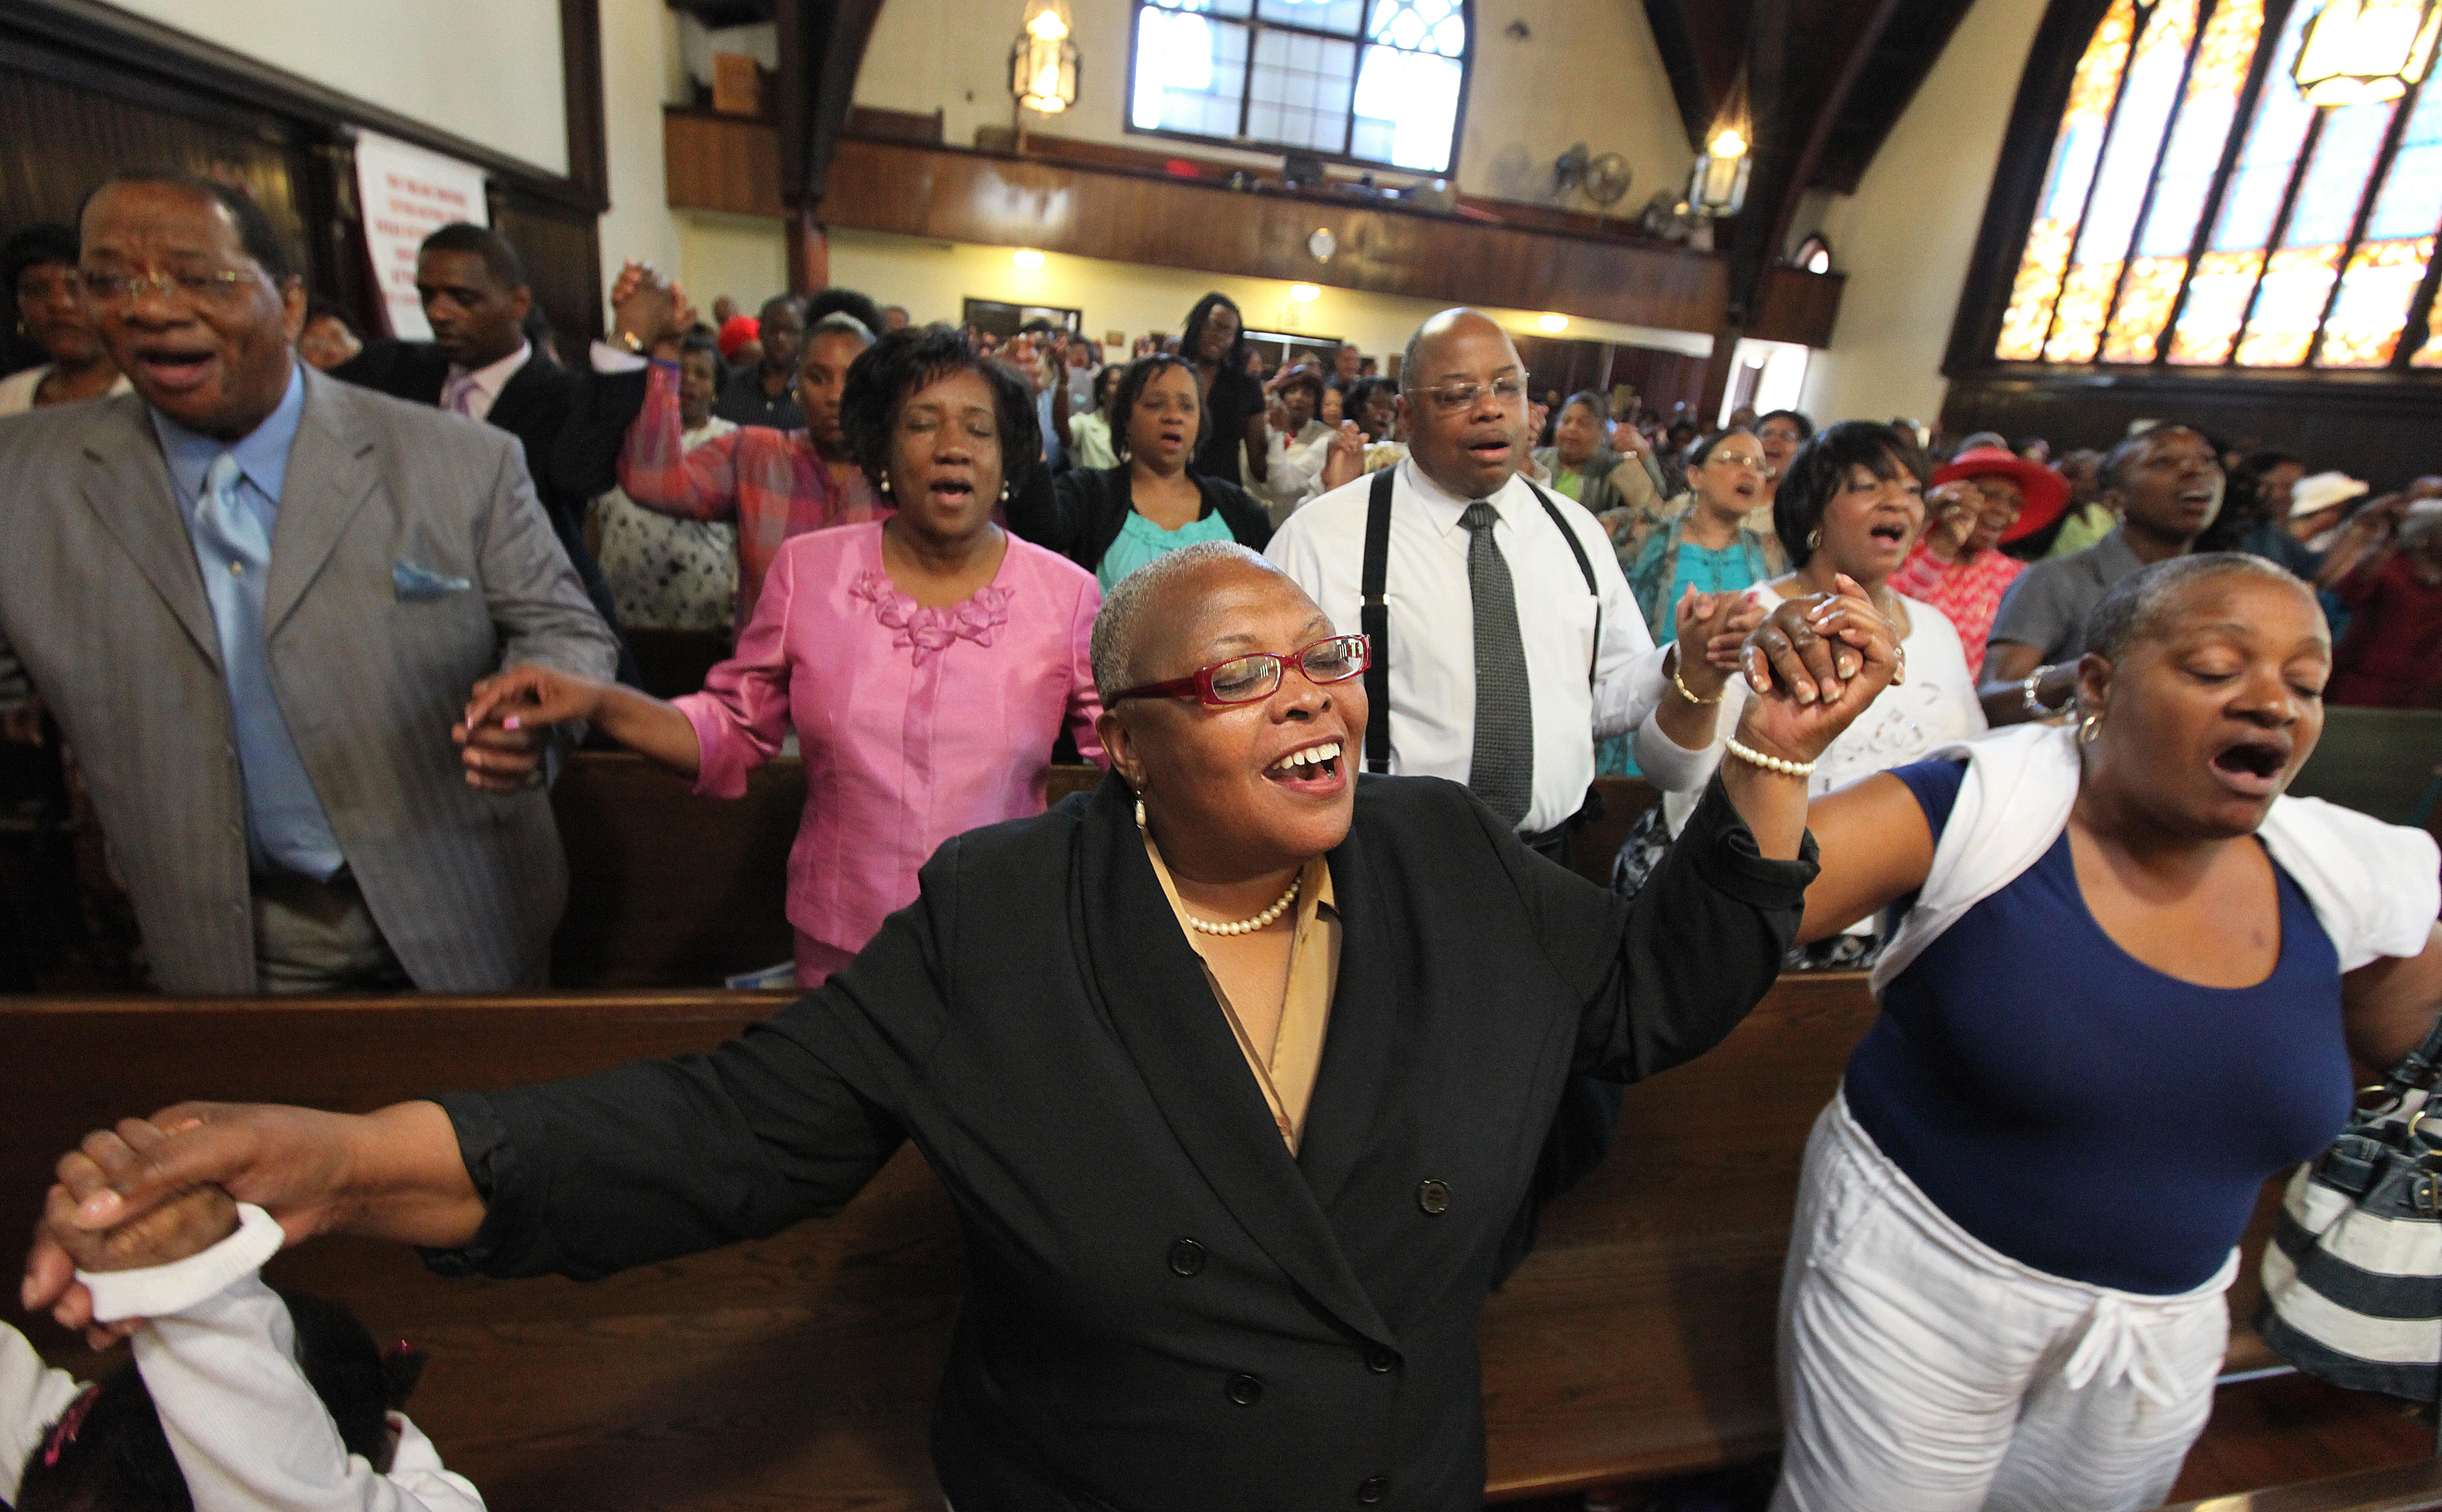 Sunday Service At Grant AME Church